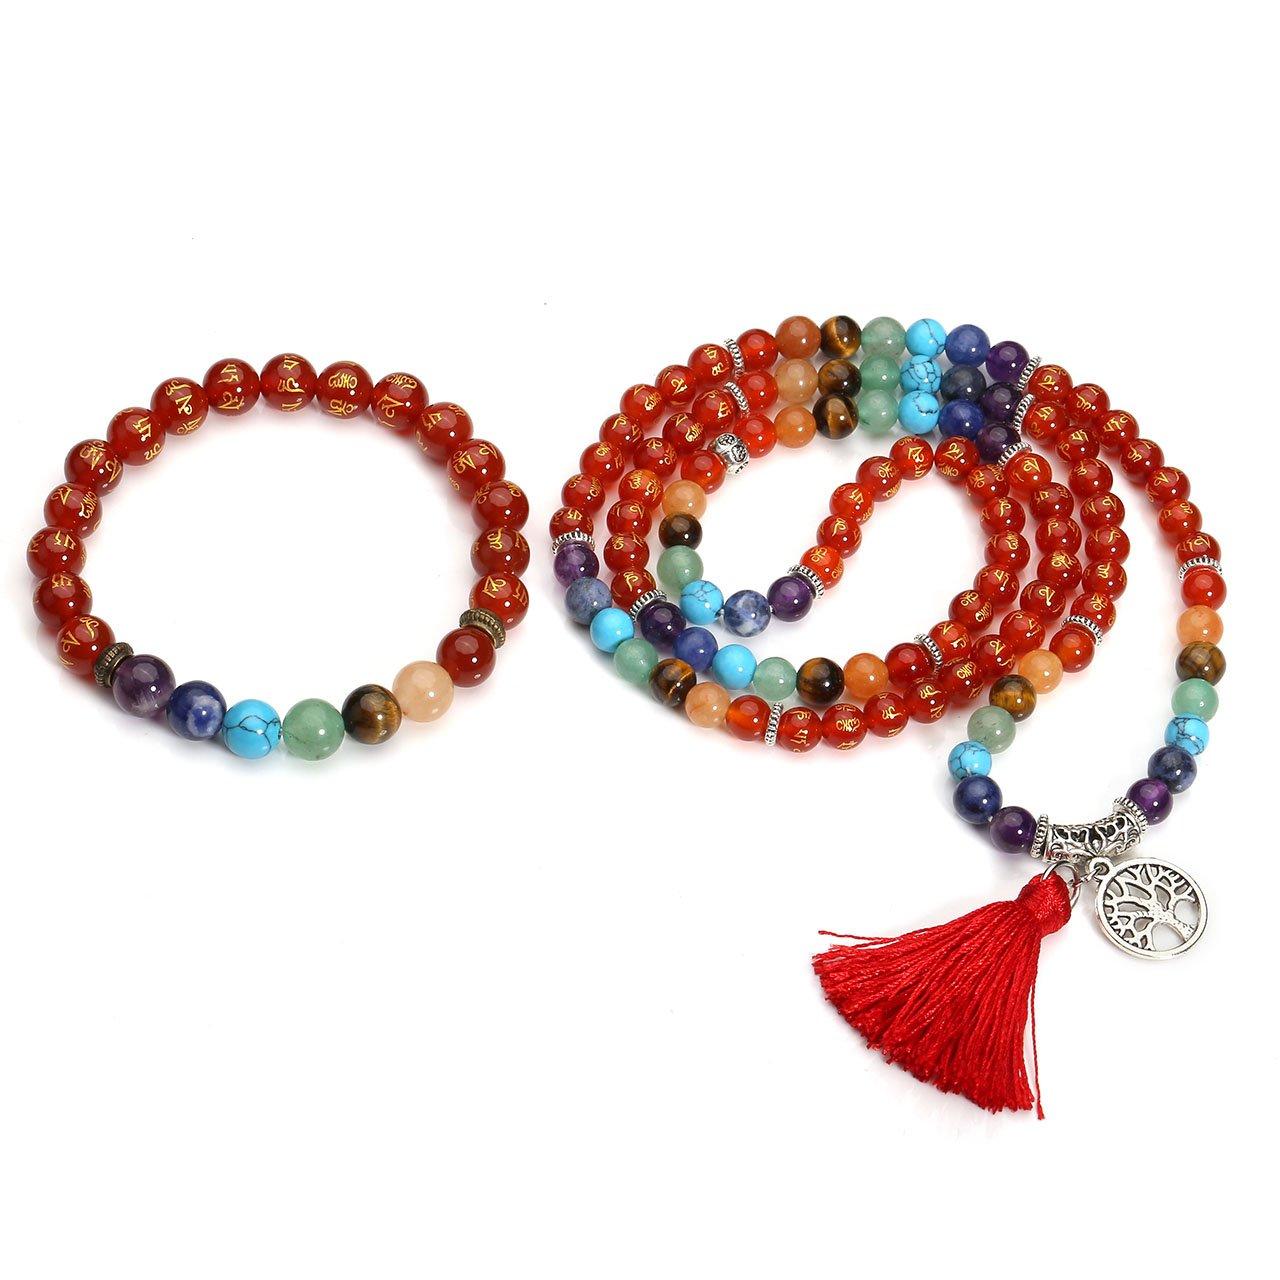 Jovivi 6mm Natural Red Agate Gemstones Om Mani Padme Hum Buddhist Prayer 108 Beads Tibetan Mala Necklace w/Tree of Life Charm + 7 Chakra Healing Crystal Bracelet